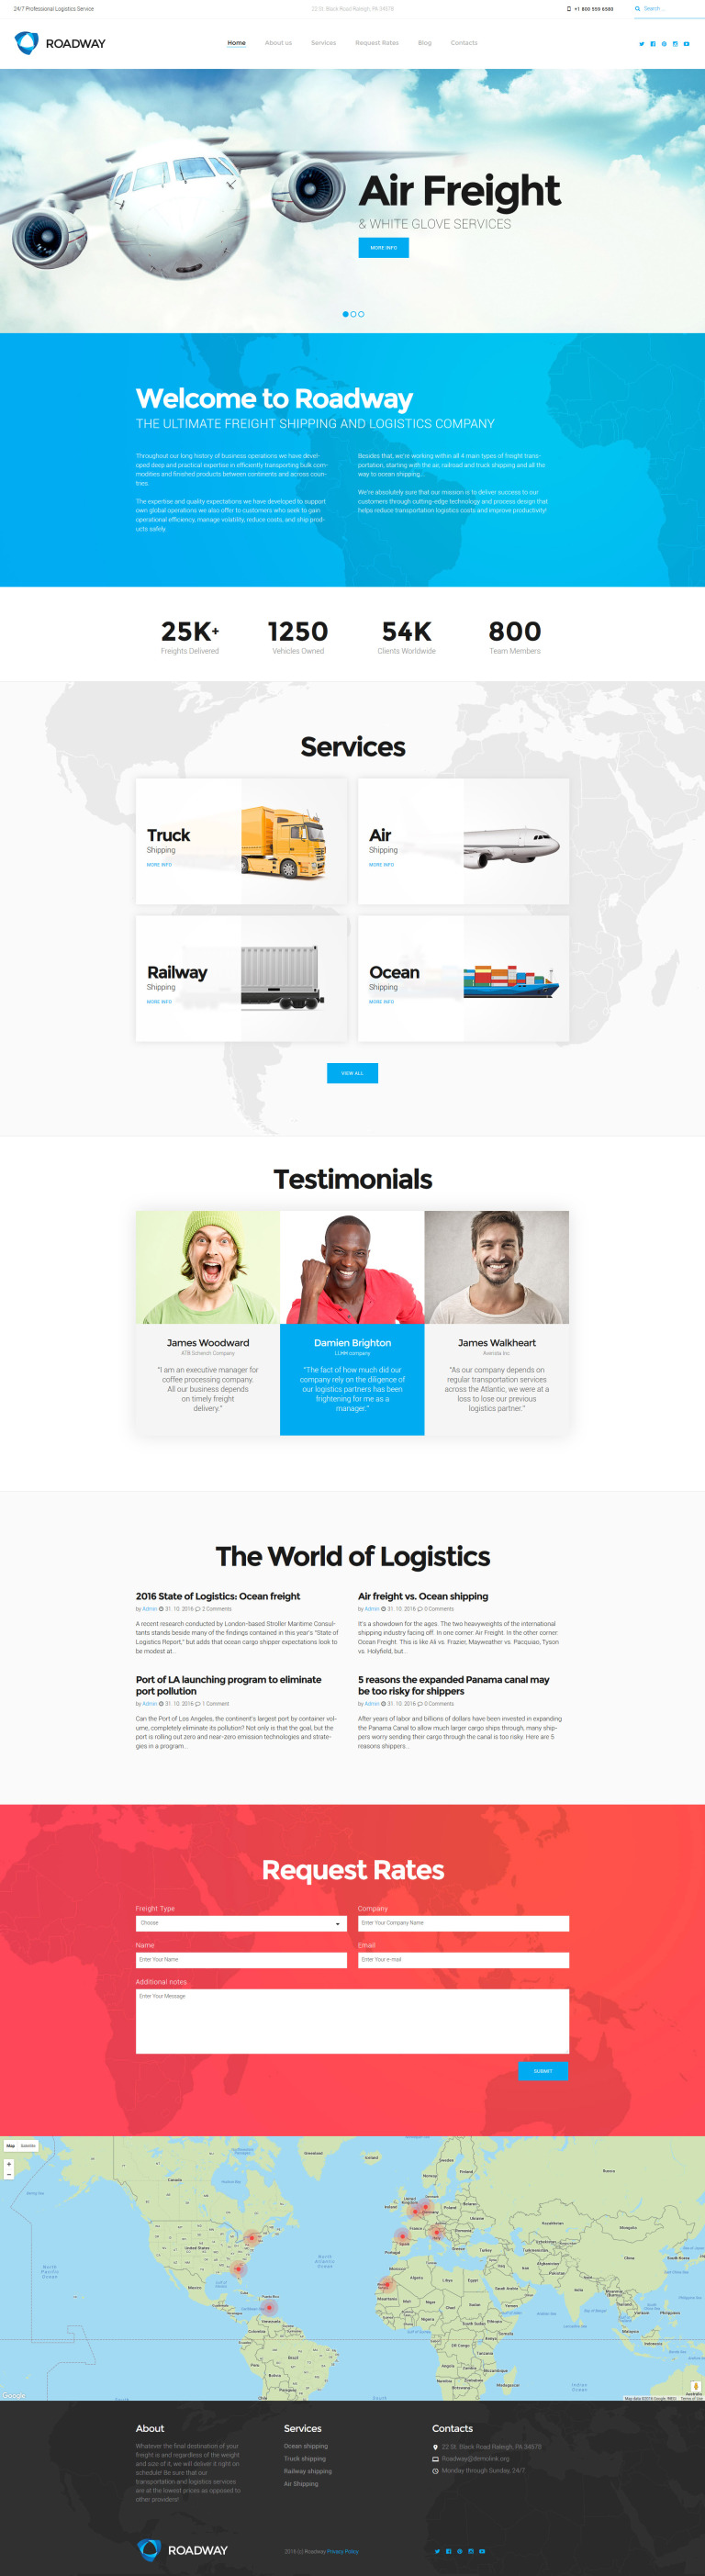 Roadway - Logistics & Transportation Services WordPress Theme New Screenshots BIG